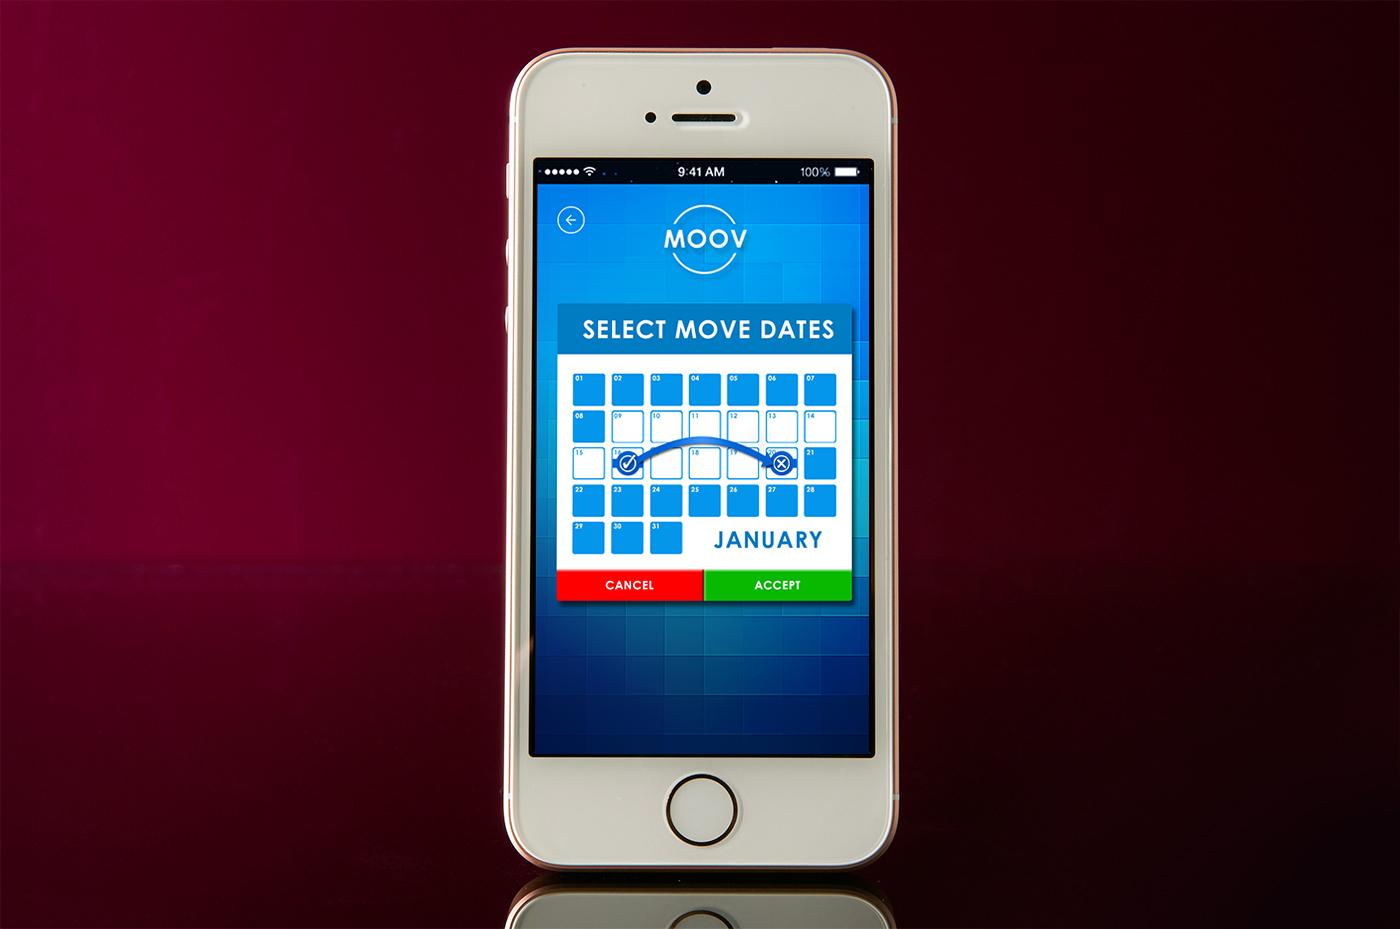 Iphone_App_Mock_Up_Select_move_date_mockup.jpg